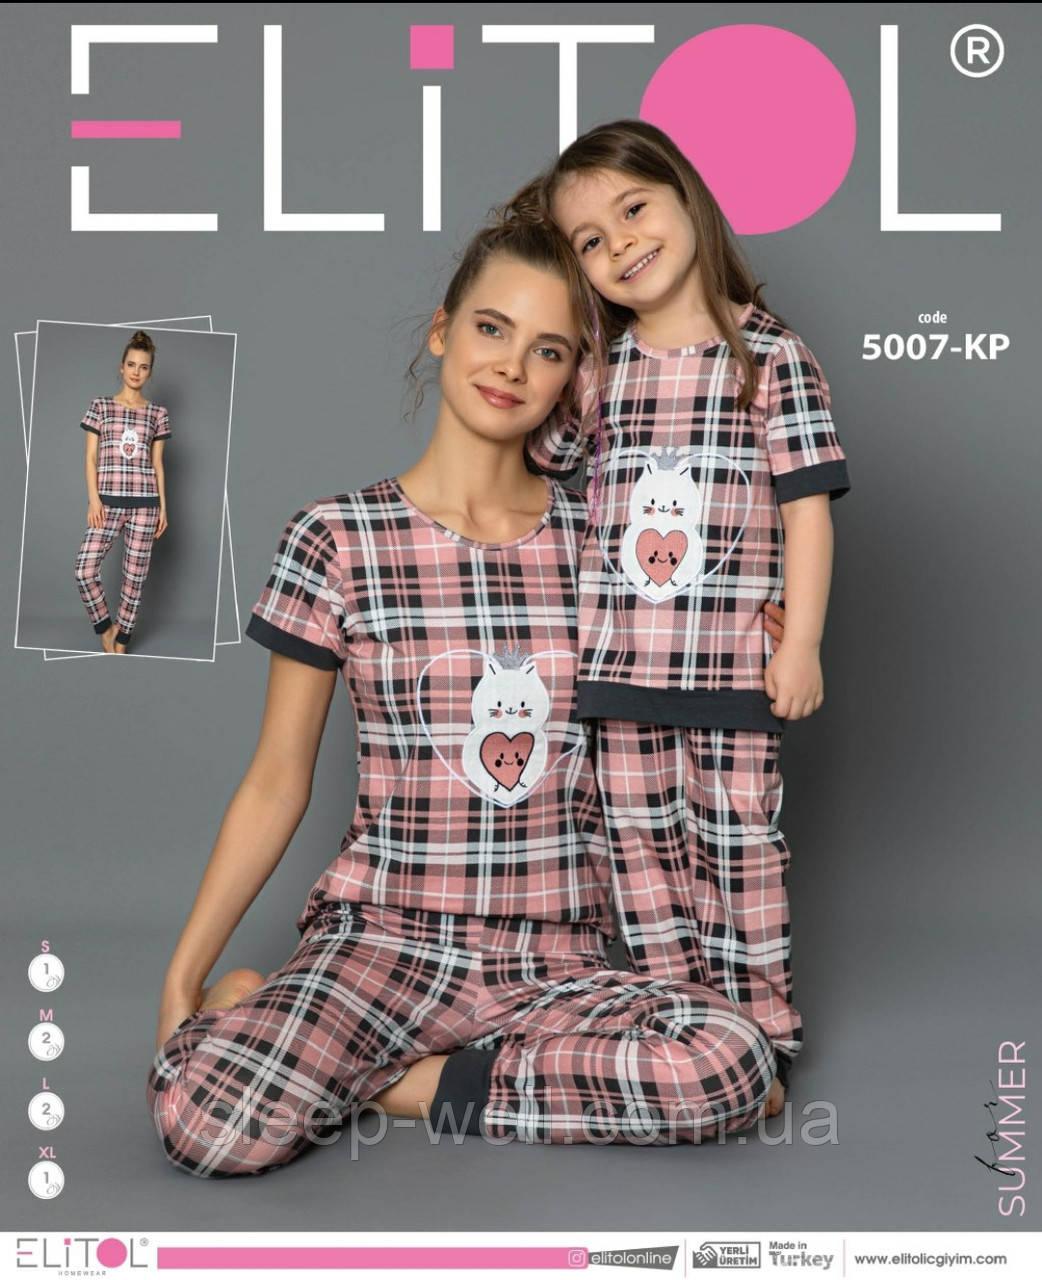 Піжама для мами і доньки,ELITOL